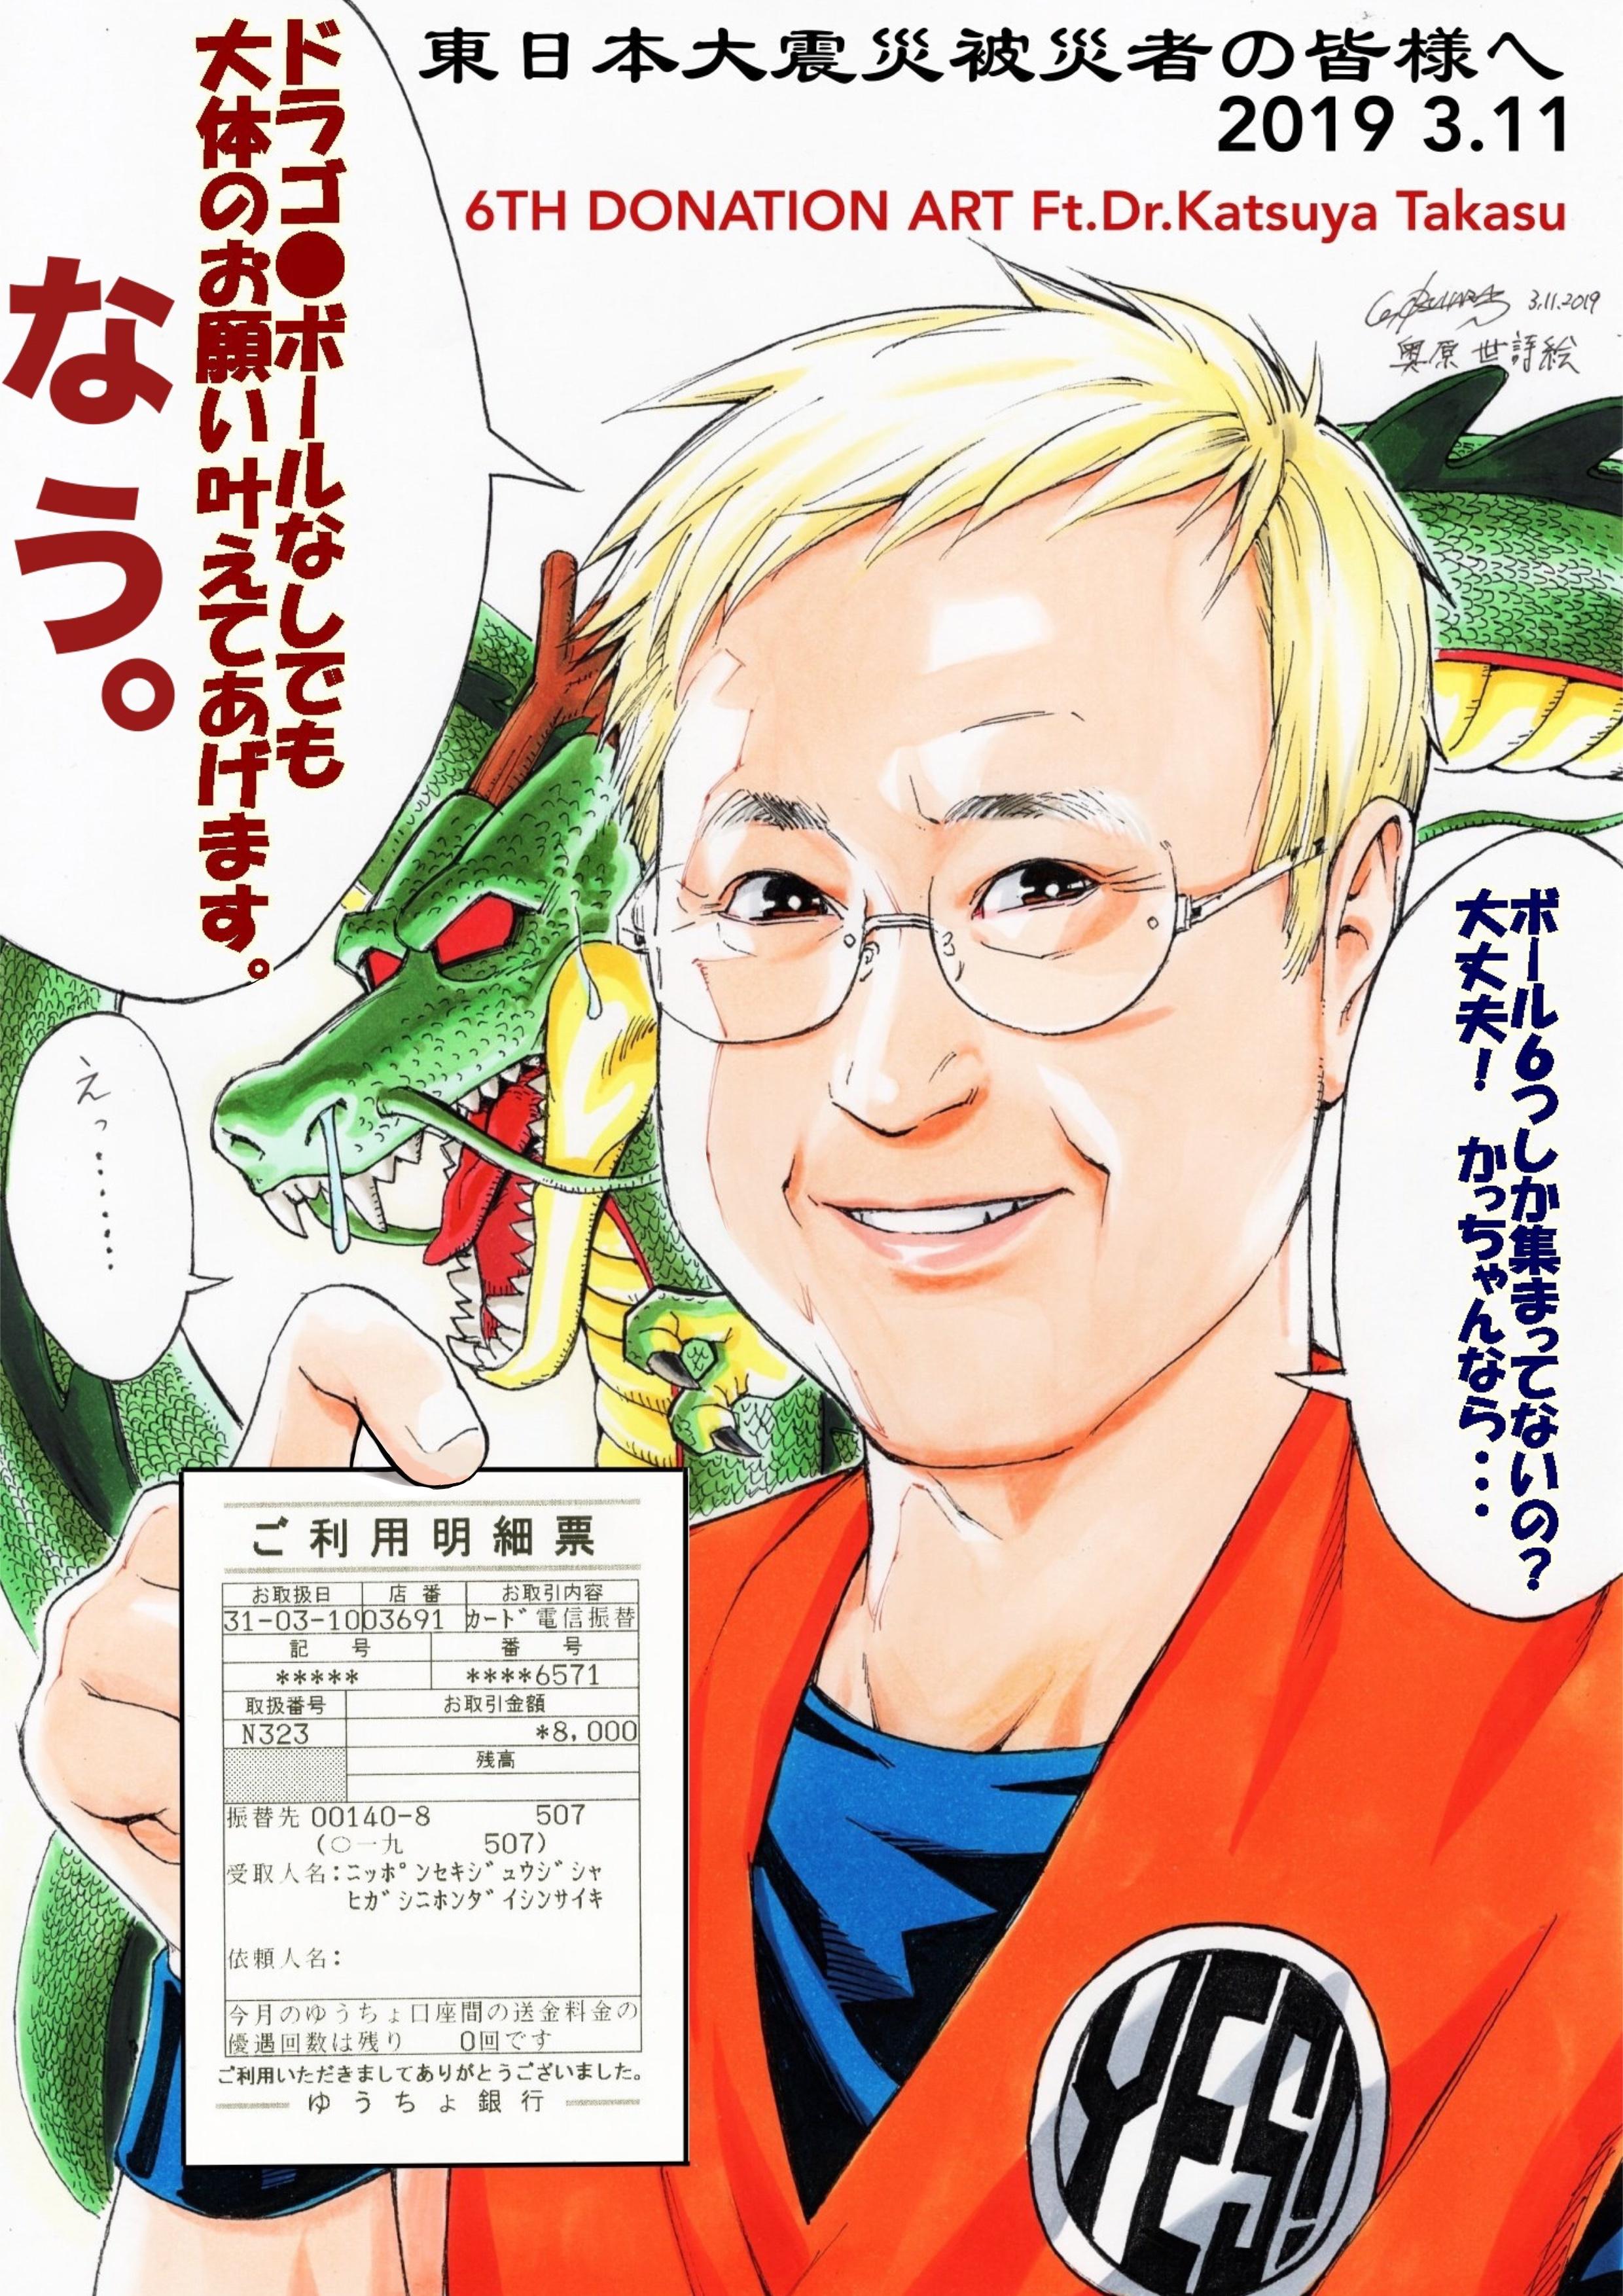 3.11 DONATION ART Ft.高須克弥院長-東日本大震災被災者の皆様へ贈る寄付アート2019-